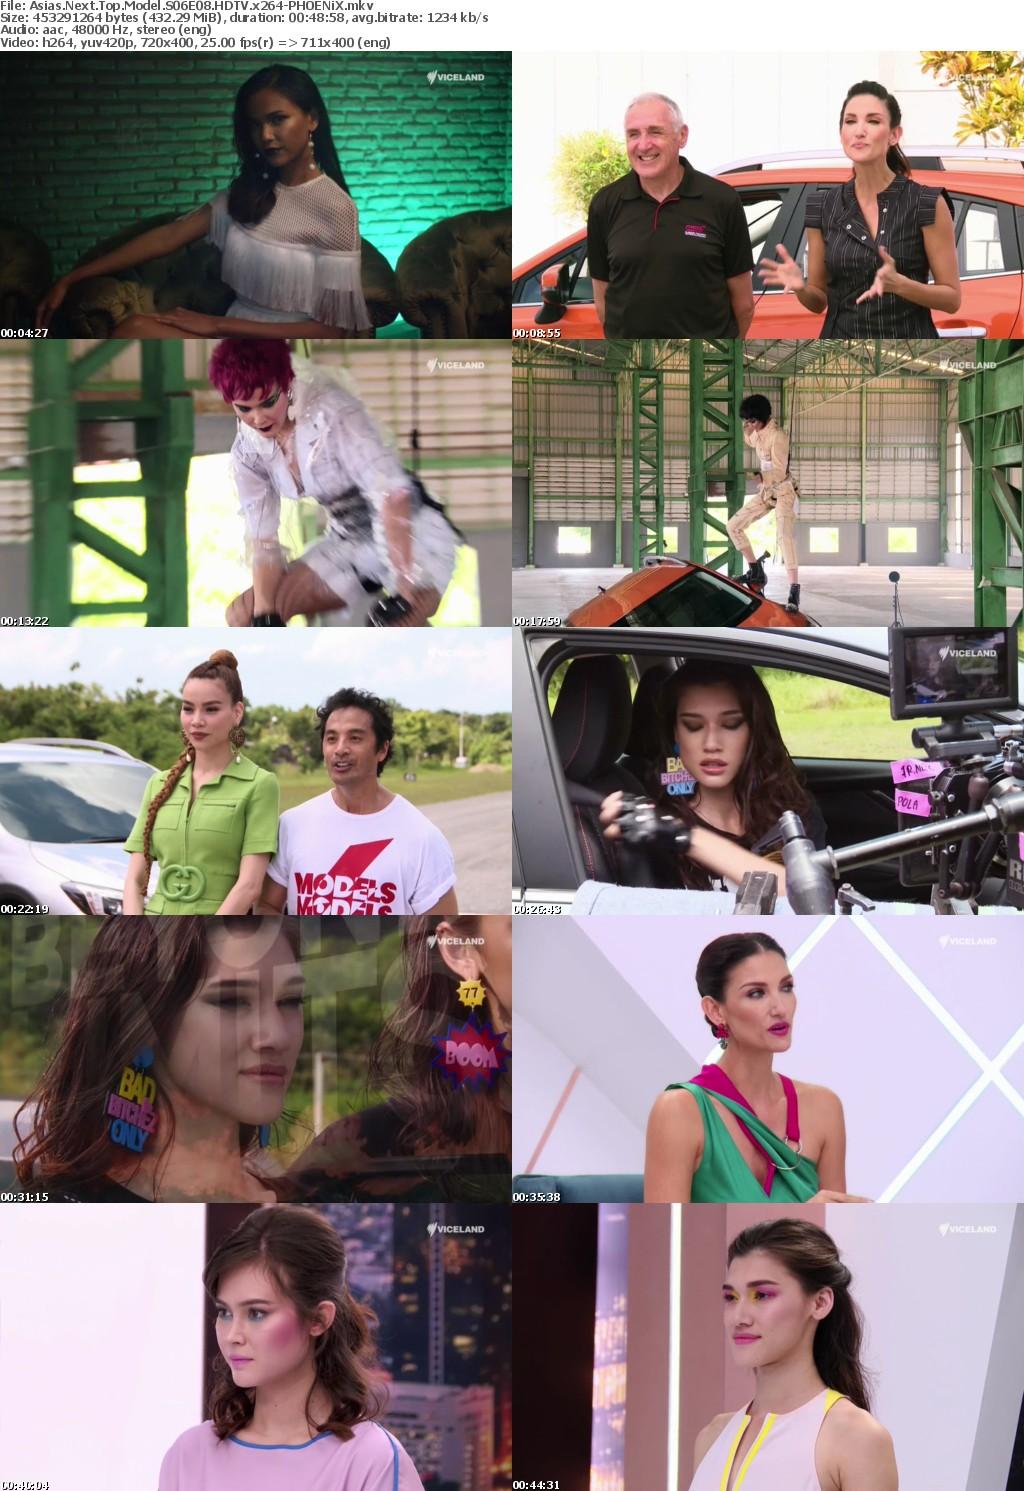 Asias Next Top Model S06E08 HDTV x264-PHOENiX